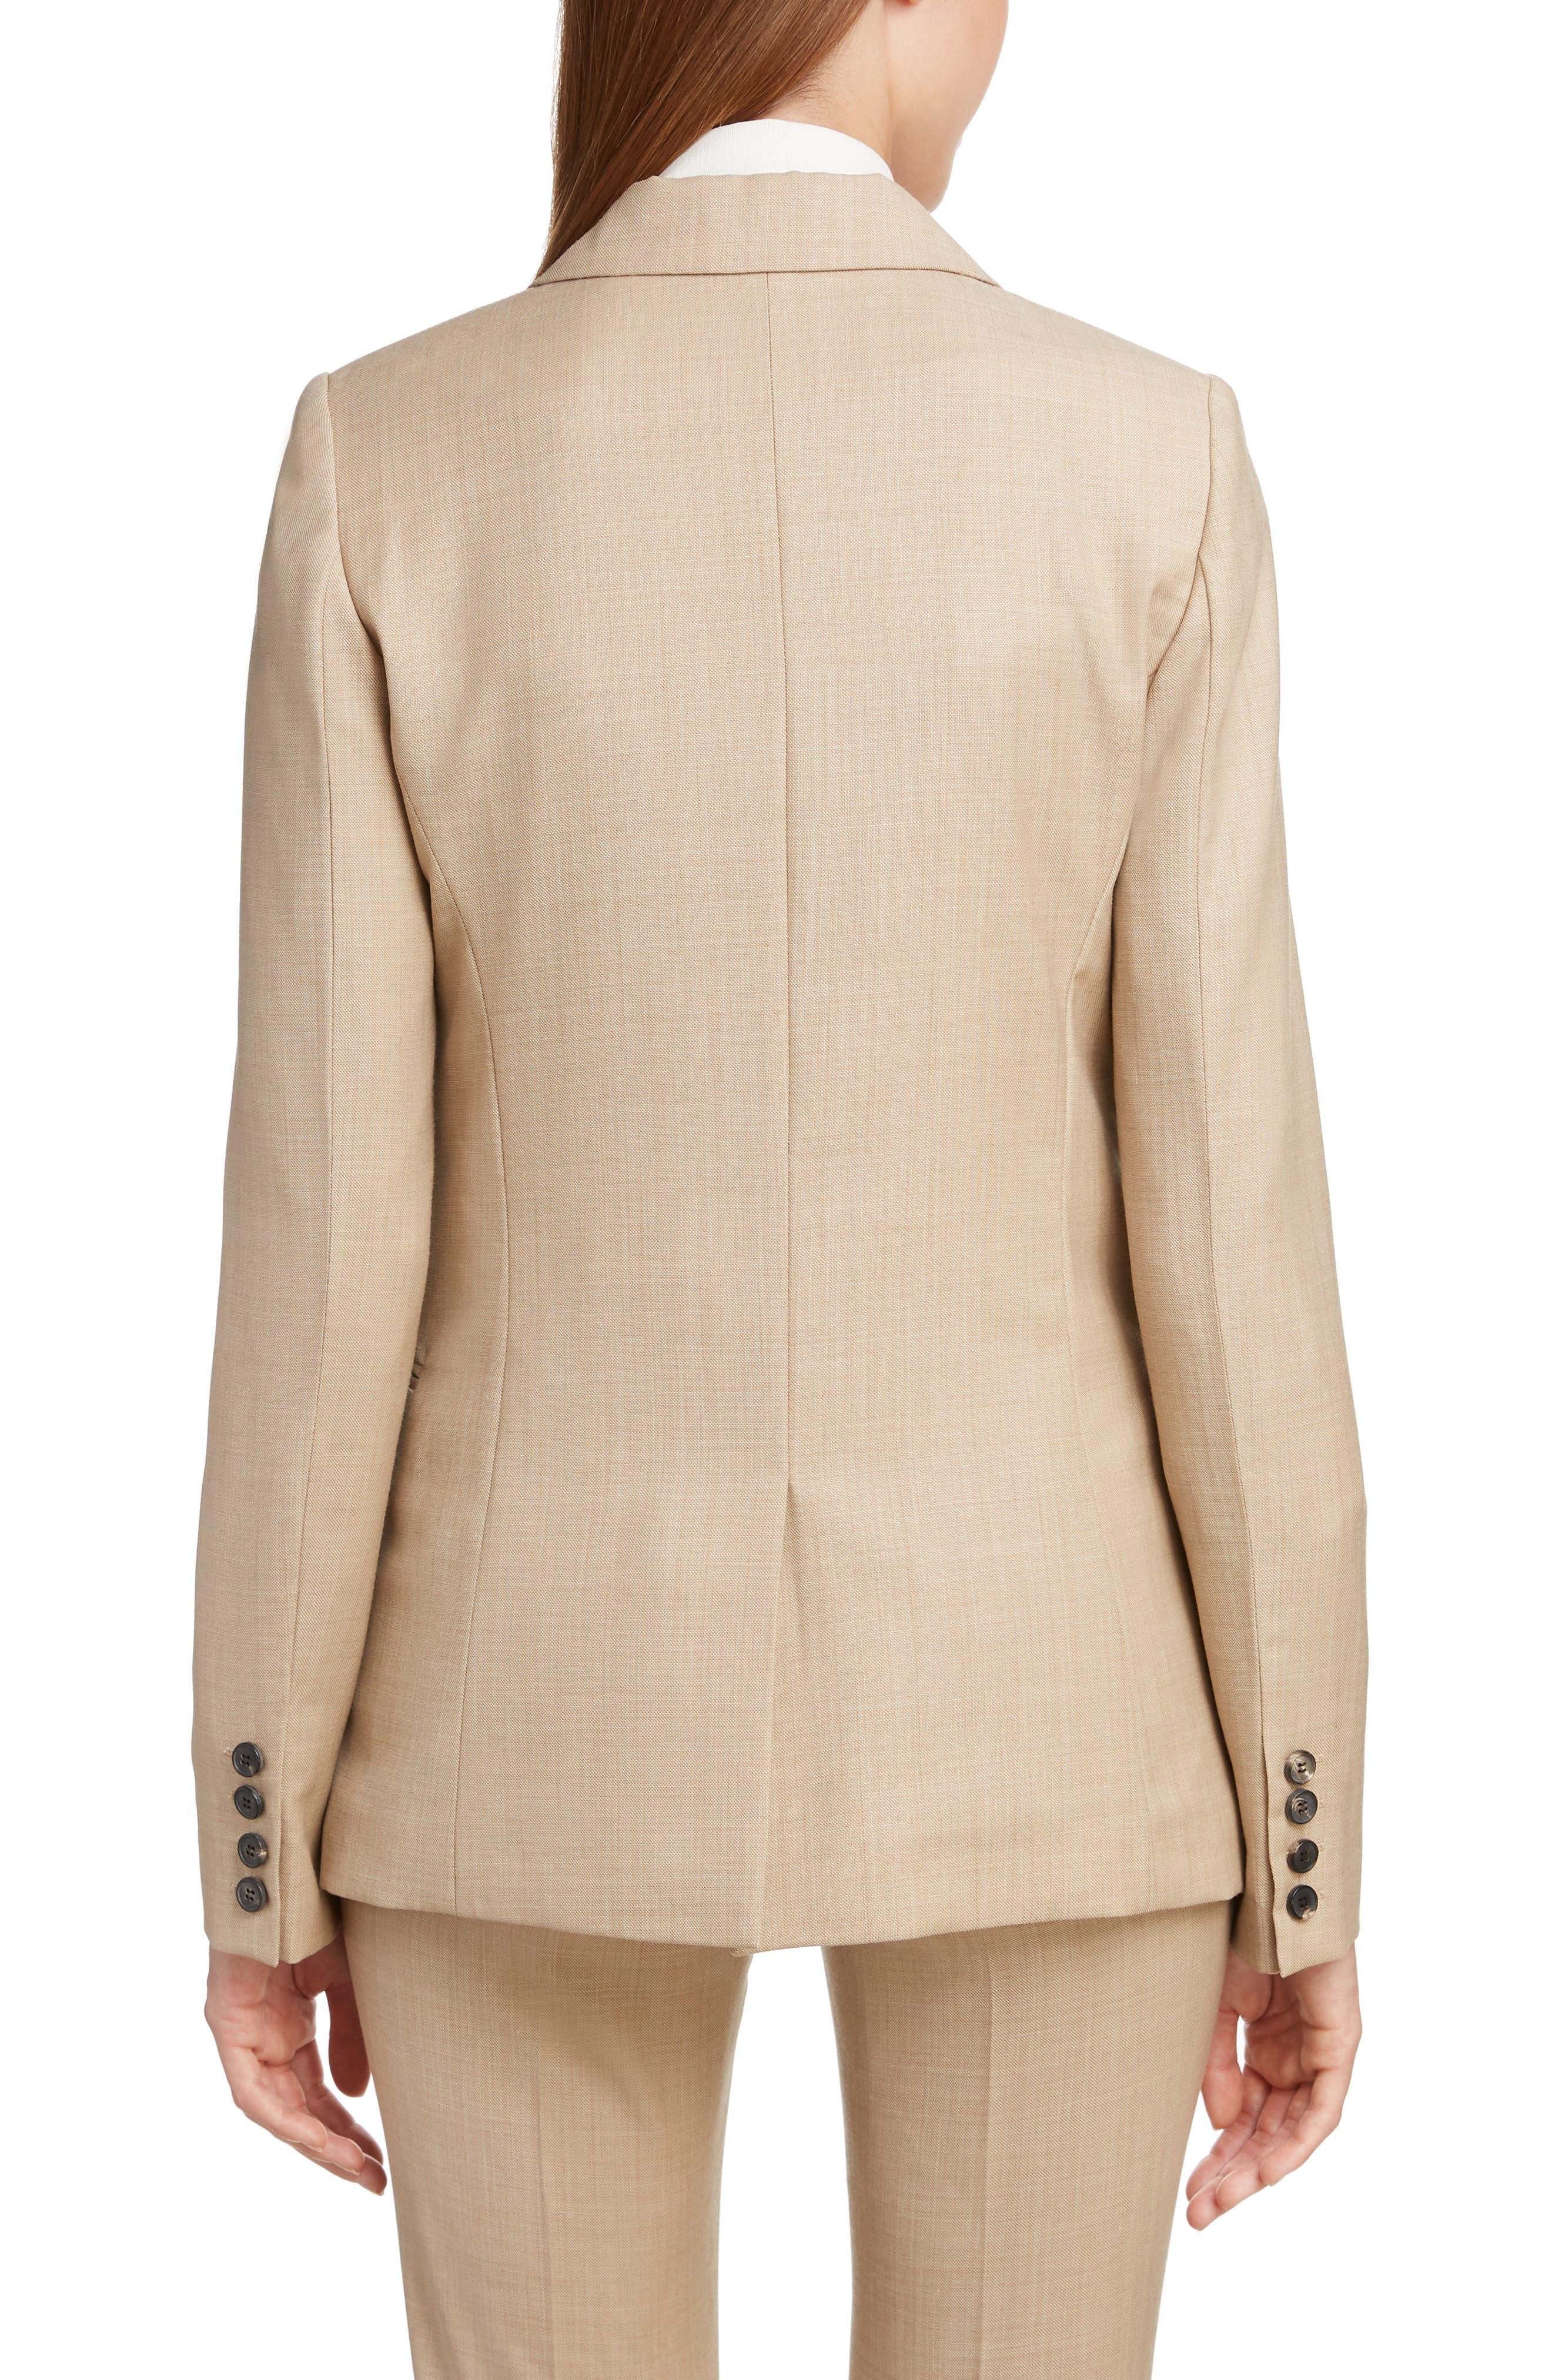 VICTORIA BECKHAM, Wool Jacket, Alternate thumbnail 2, color, LIGHT BEIGE-WHITE